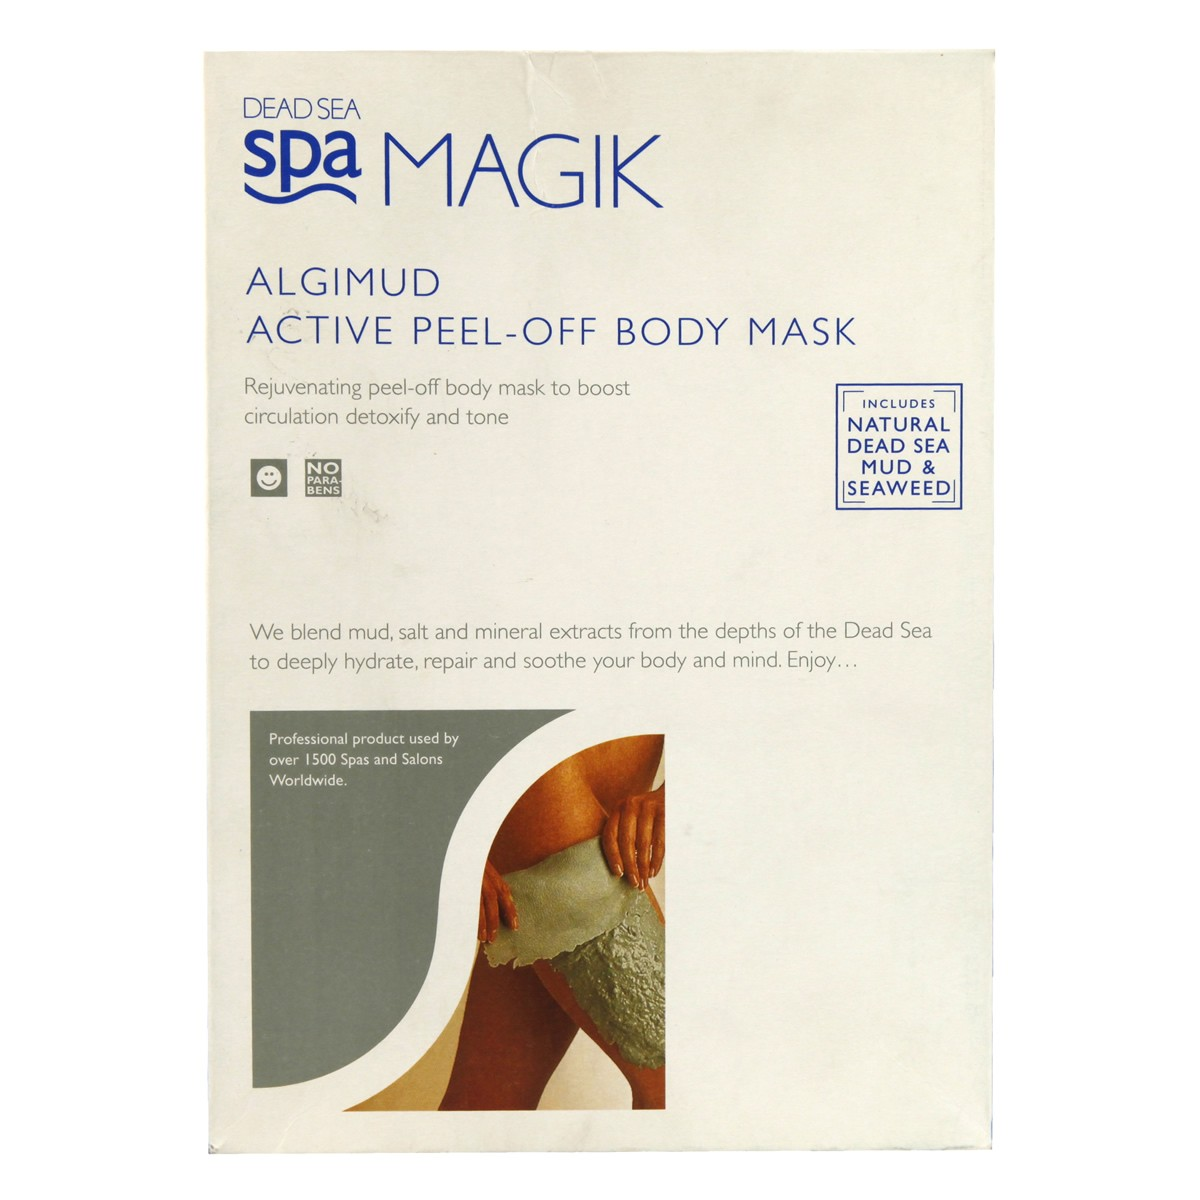 Dead Sea Spa Magik Algimud Active Peel-Off Body Mask